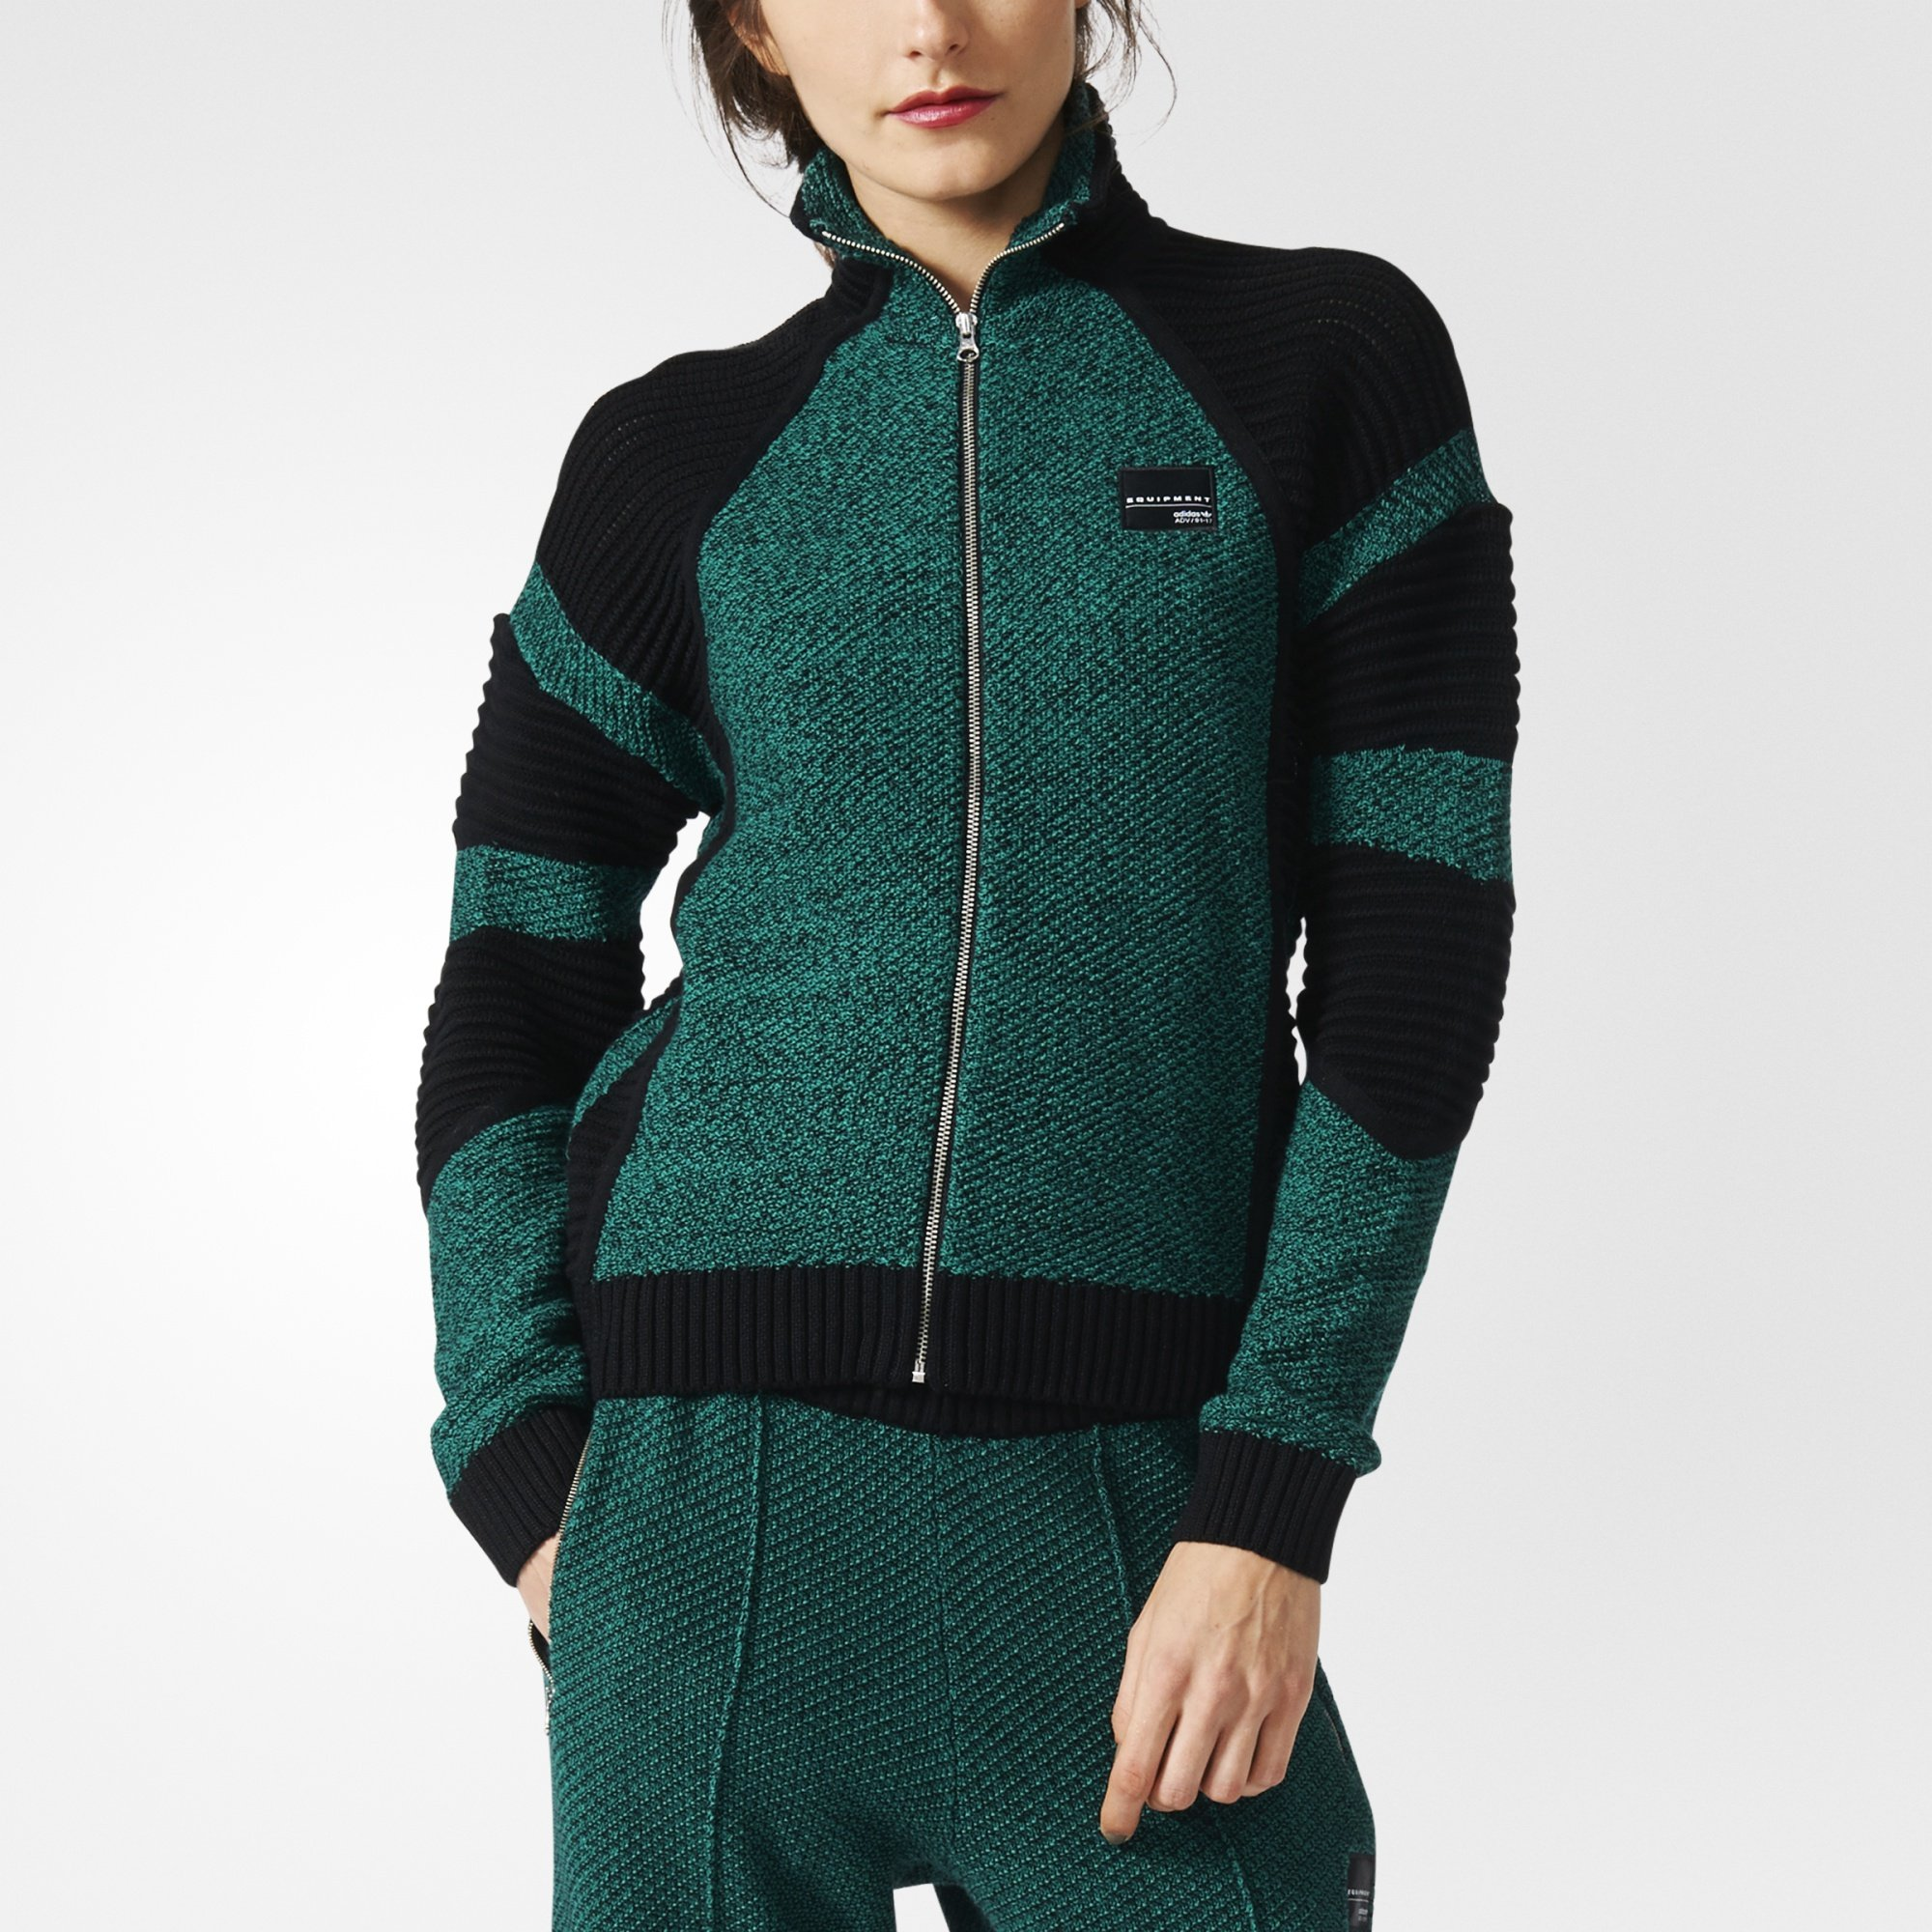 Adidas Originals Women's Equipment ADV / 91-17 Track Top Full Zip Knit Jacket, SubGreen/Black, X-Large by adidas Originals